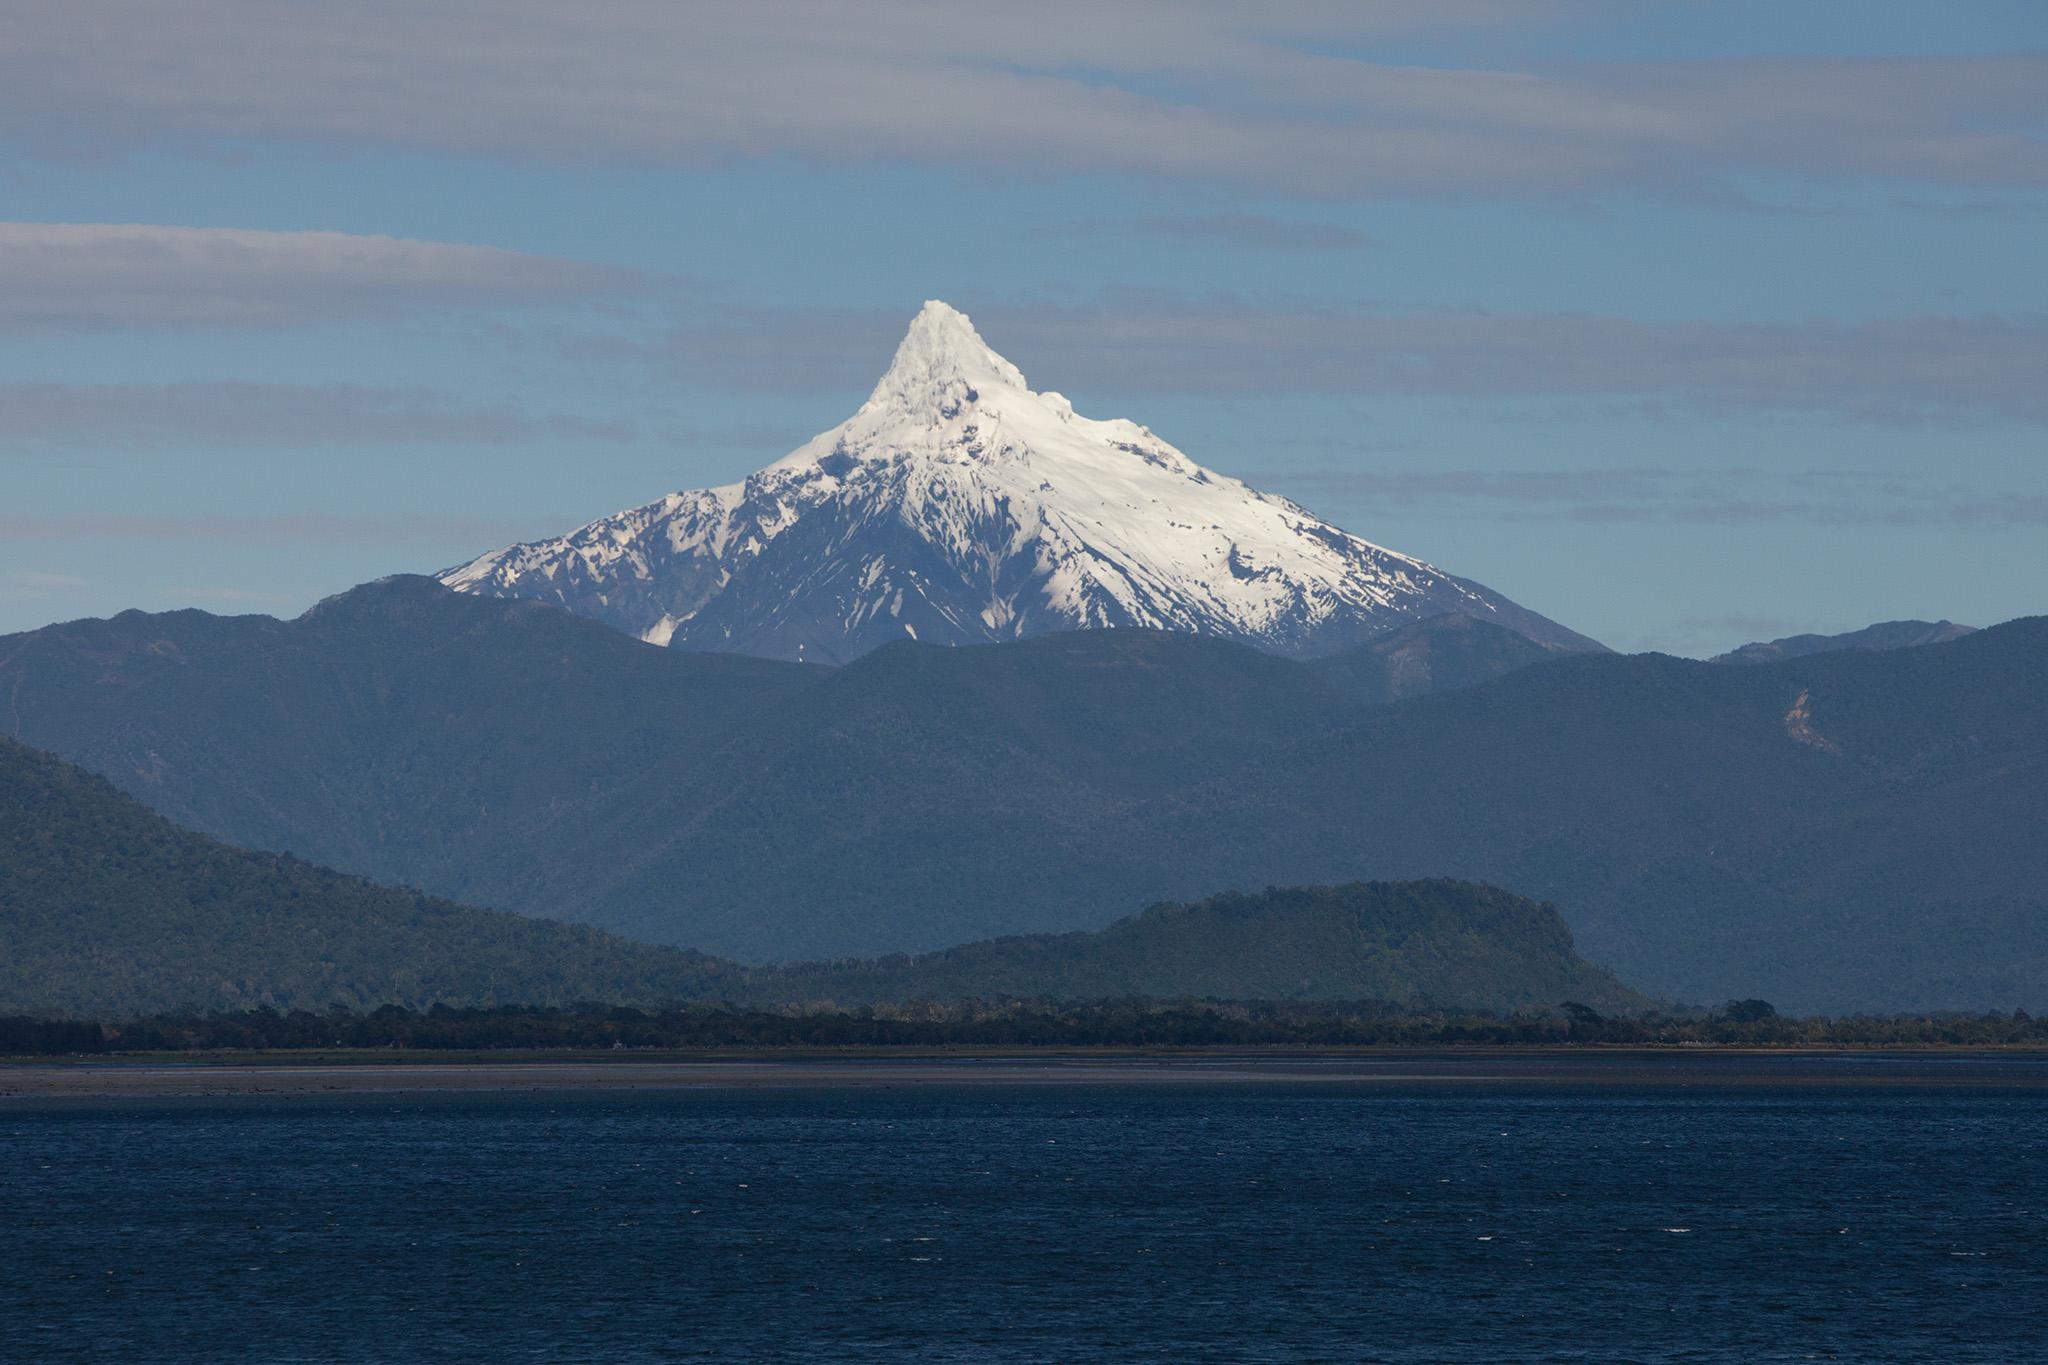 031-TW-Patagonia-140904.jpg